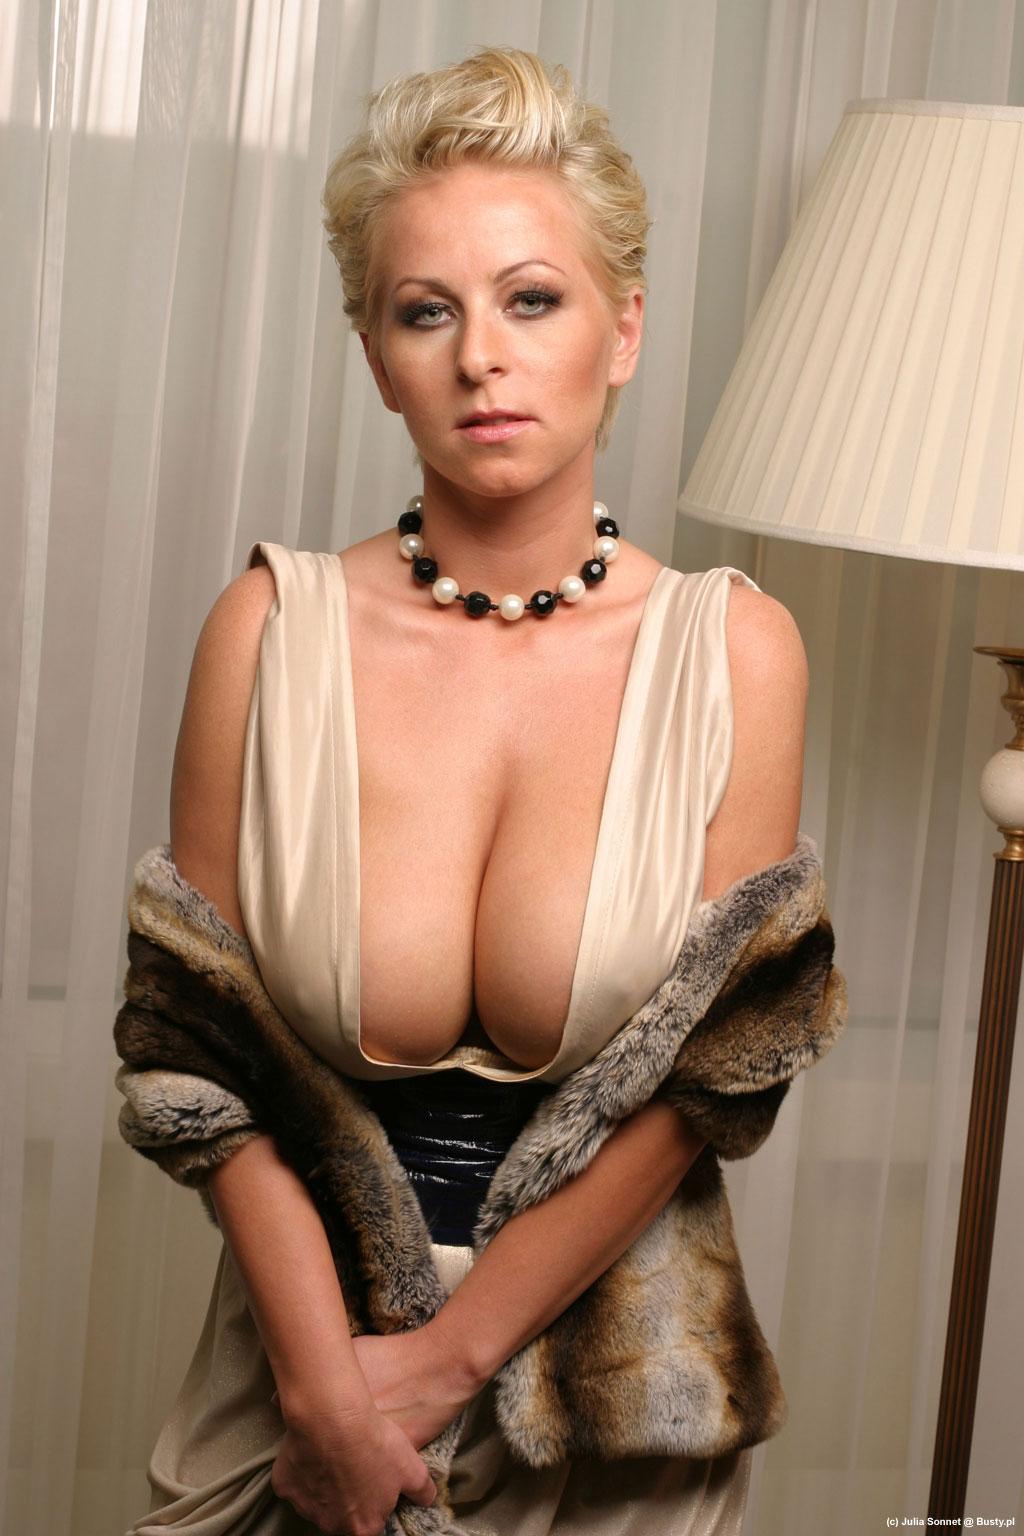 Mature mother and ex porn star karen summer go black - 73 part 7